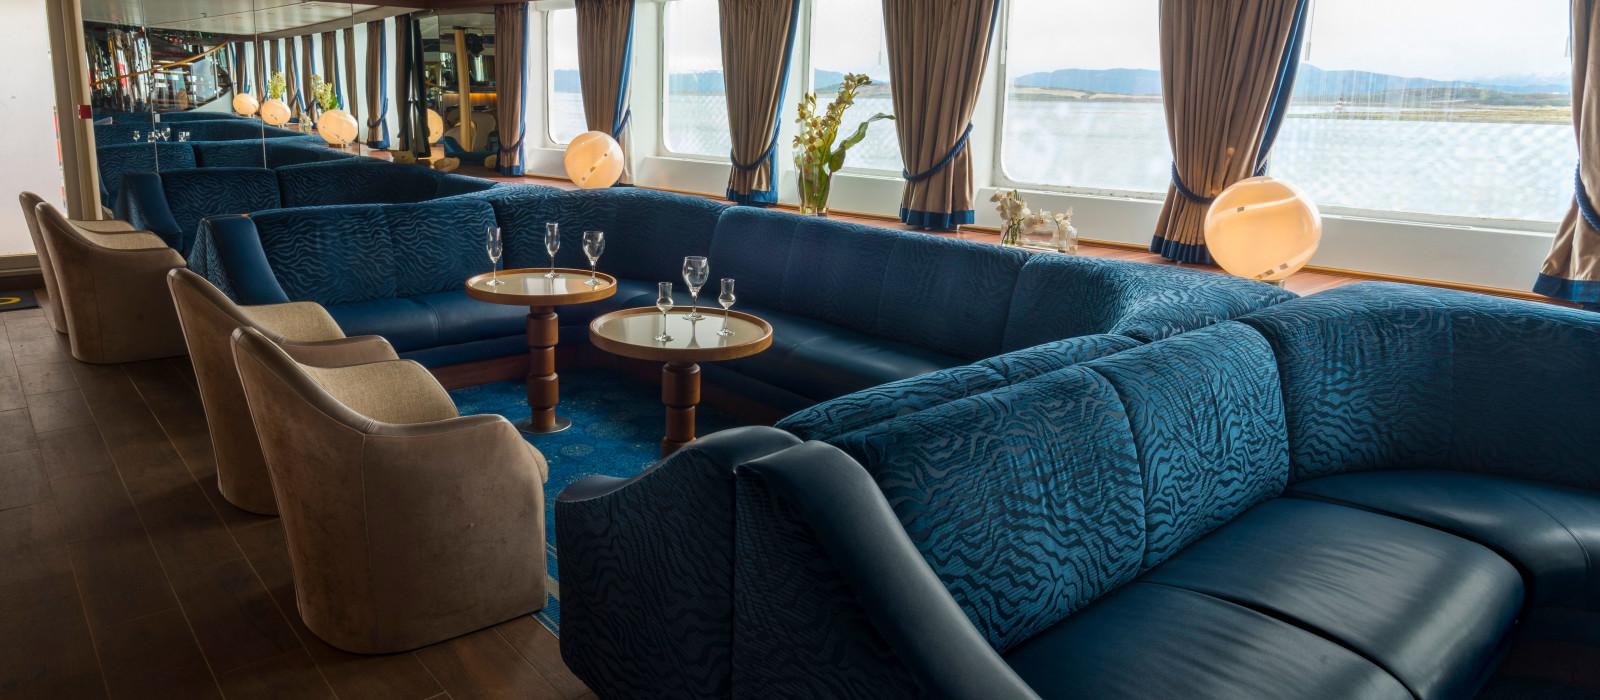 Hotel Ocean Diamond by Quark Expeditions, Antarctica Antarctica